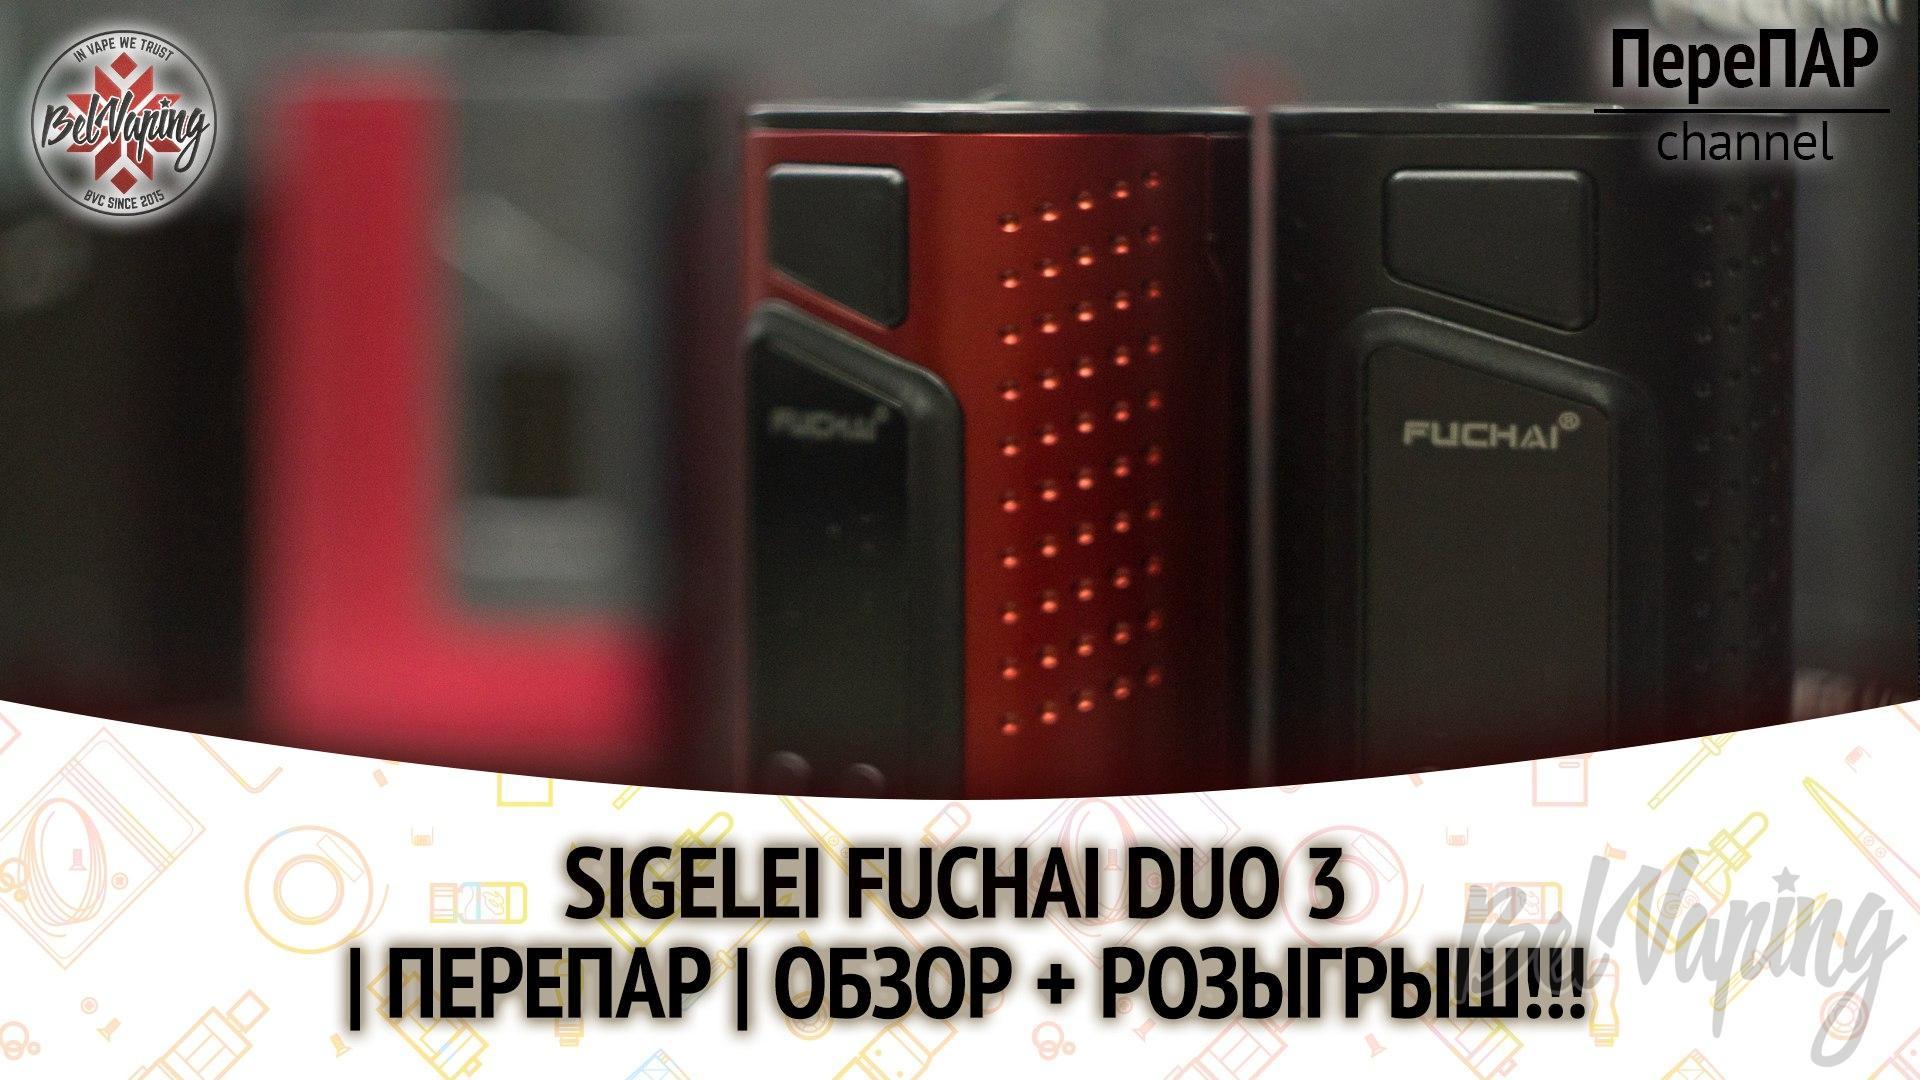 Обзор Sigelei Fuchai DUO 3